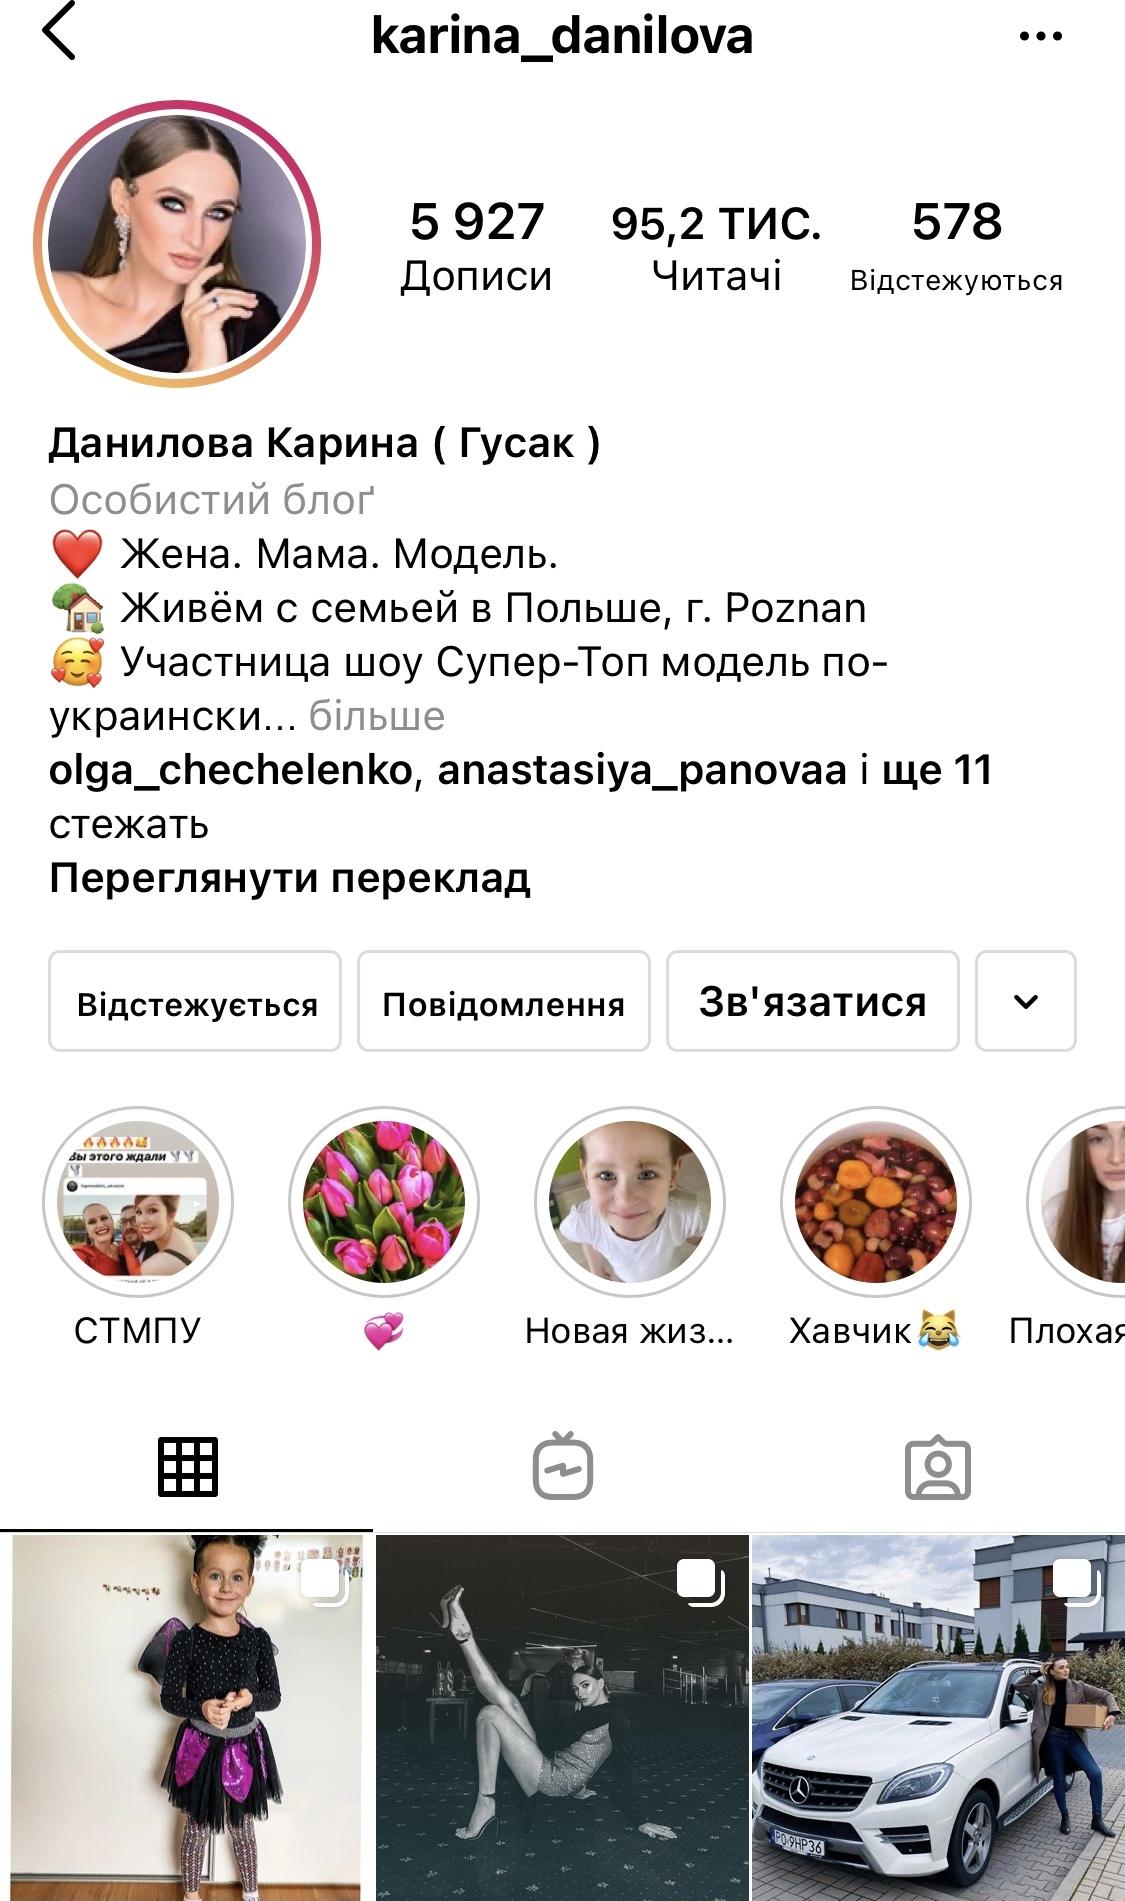 карина данилова инстаграм